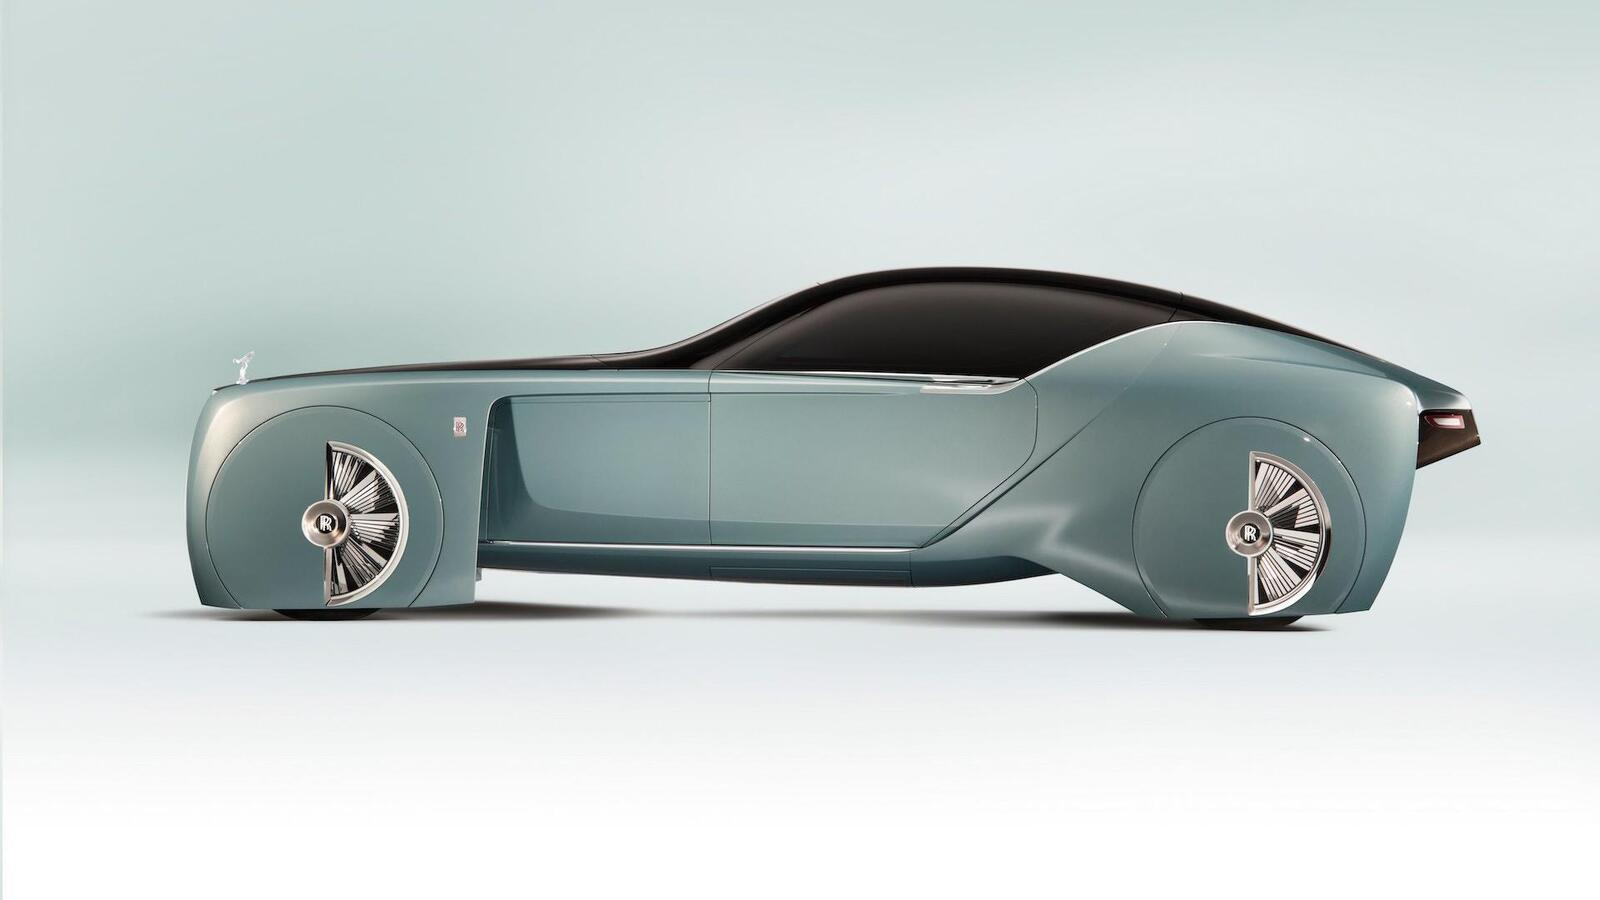 rolls-royce-vision-next-100-concept4.jpg